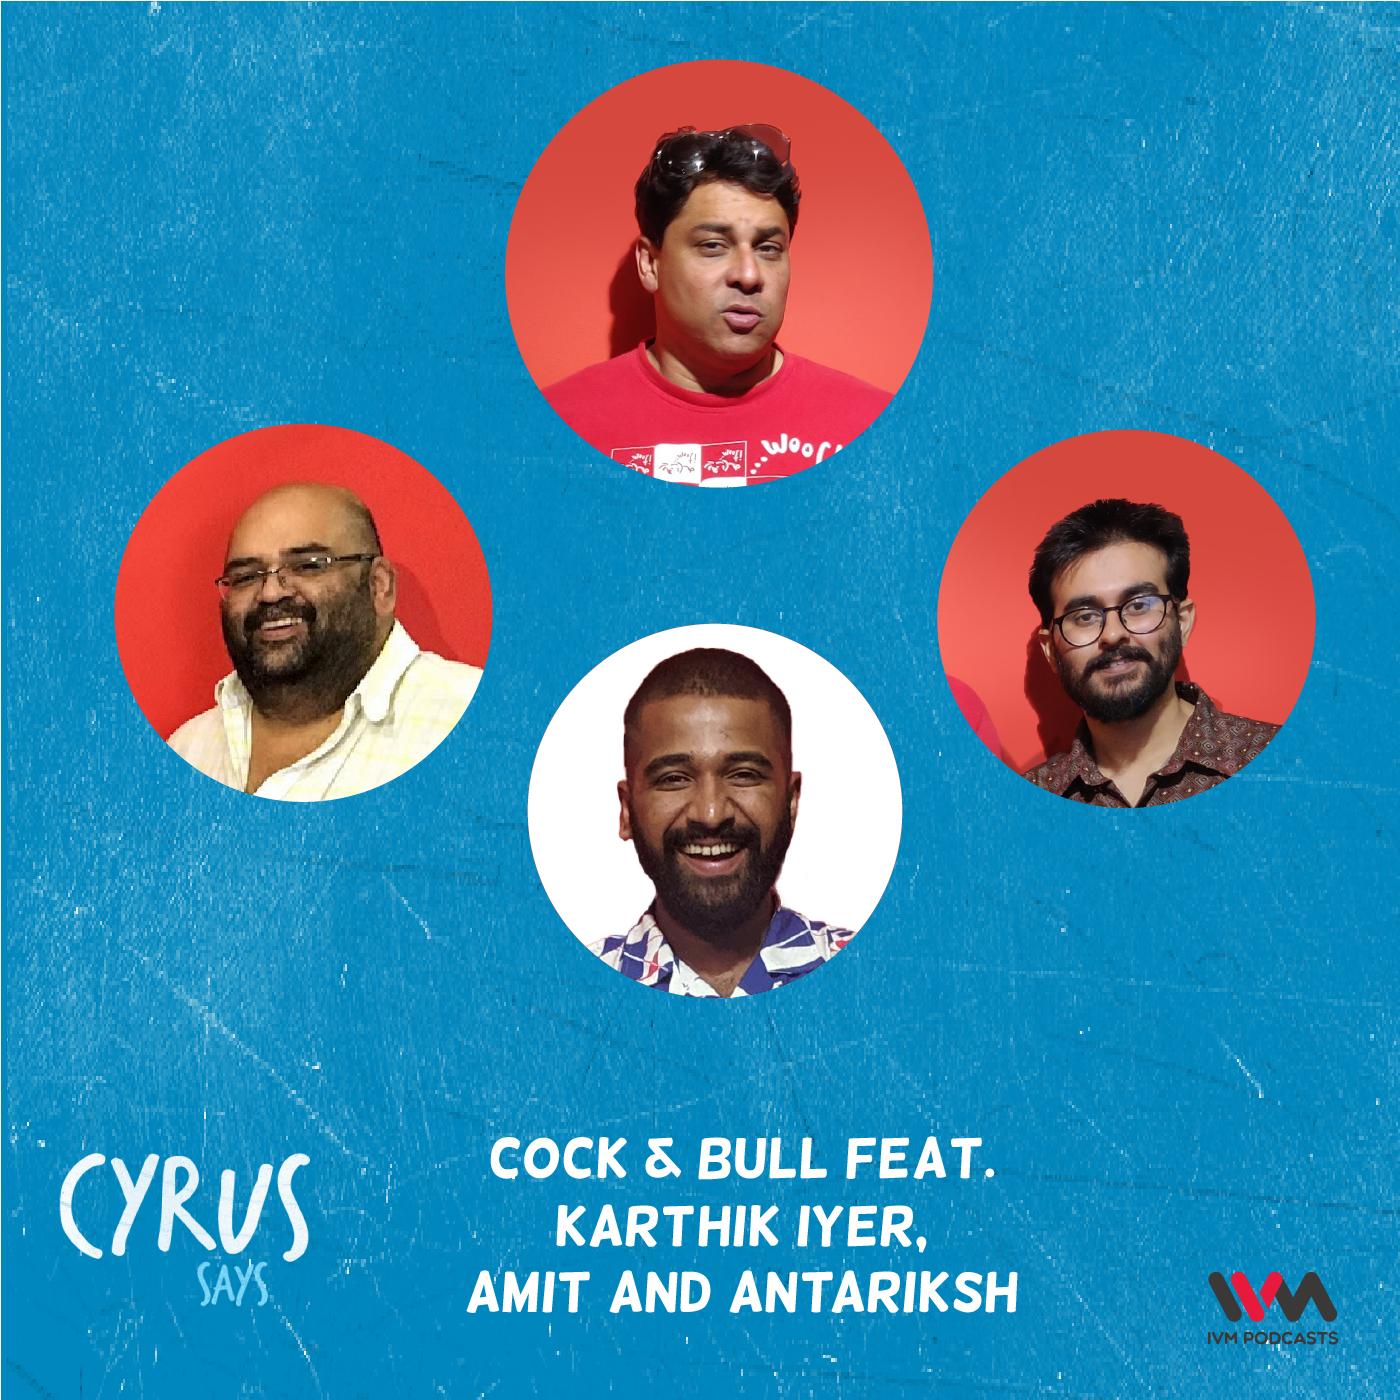 Ep. 593: Cock & Bull feat. Karthik Iyer, Amit and Antariksh